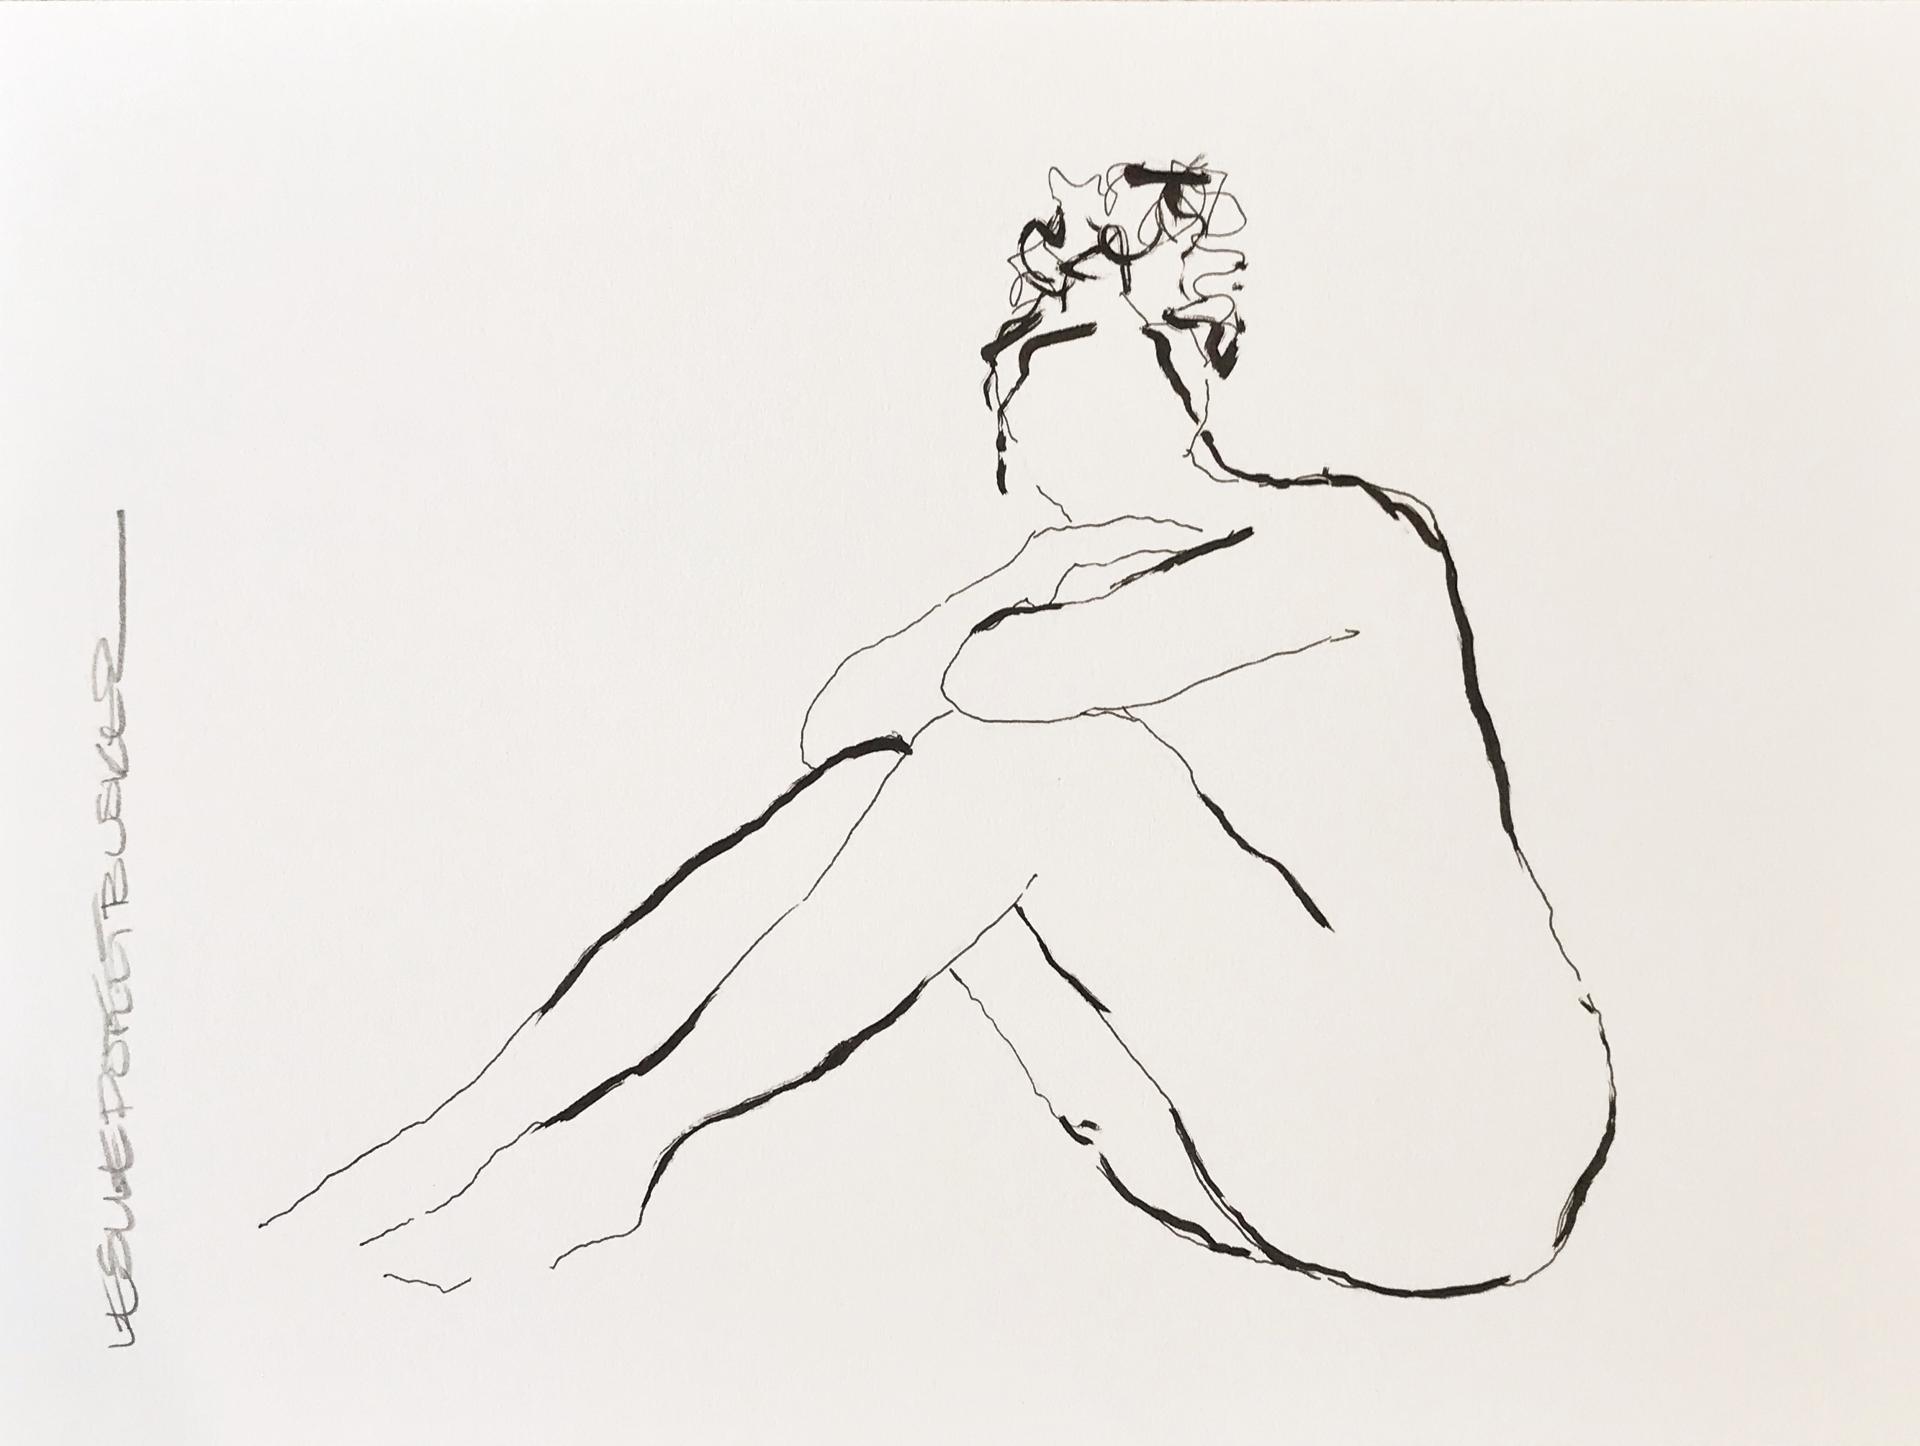 Figure No. 83 by Leslie Poteet Busker